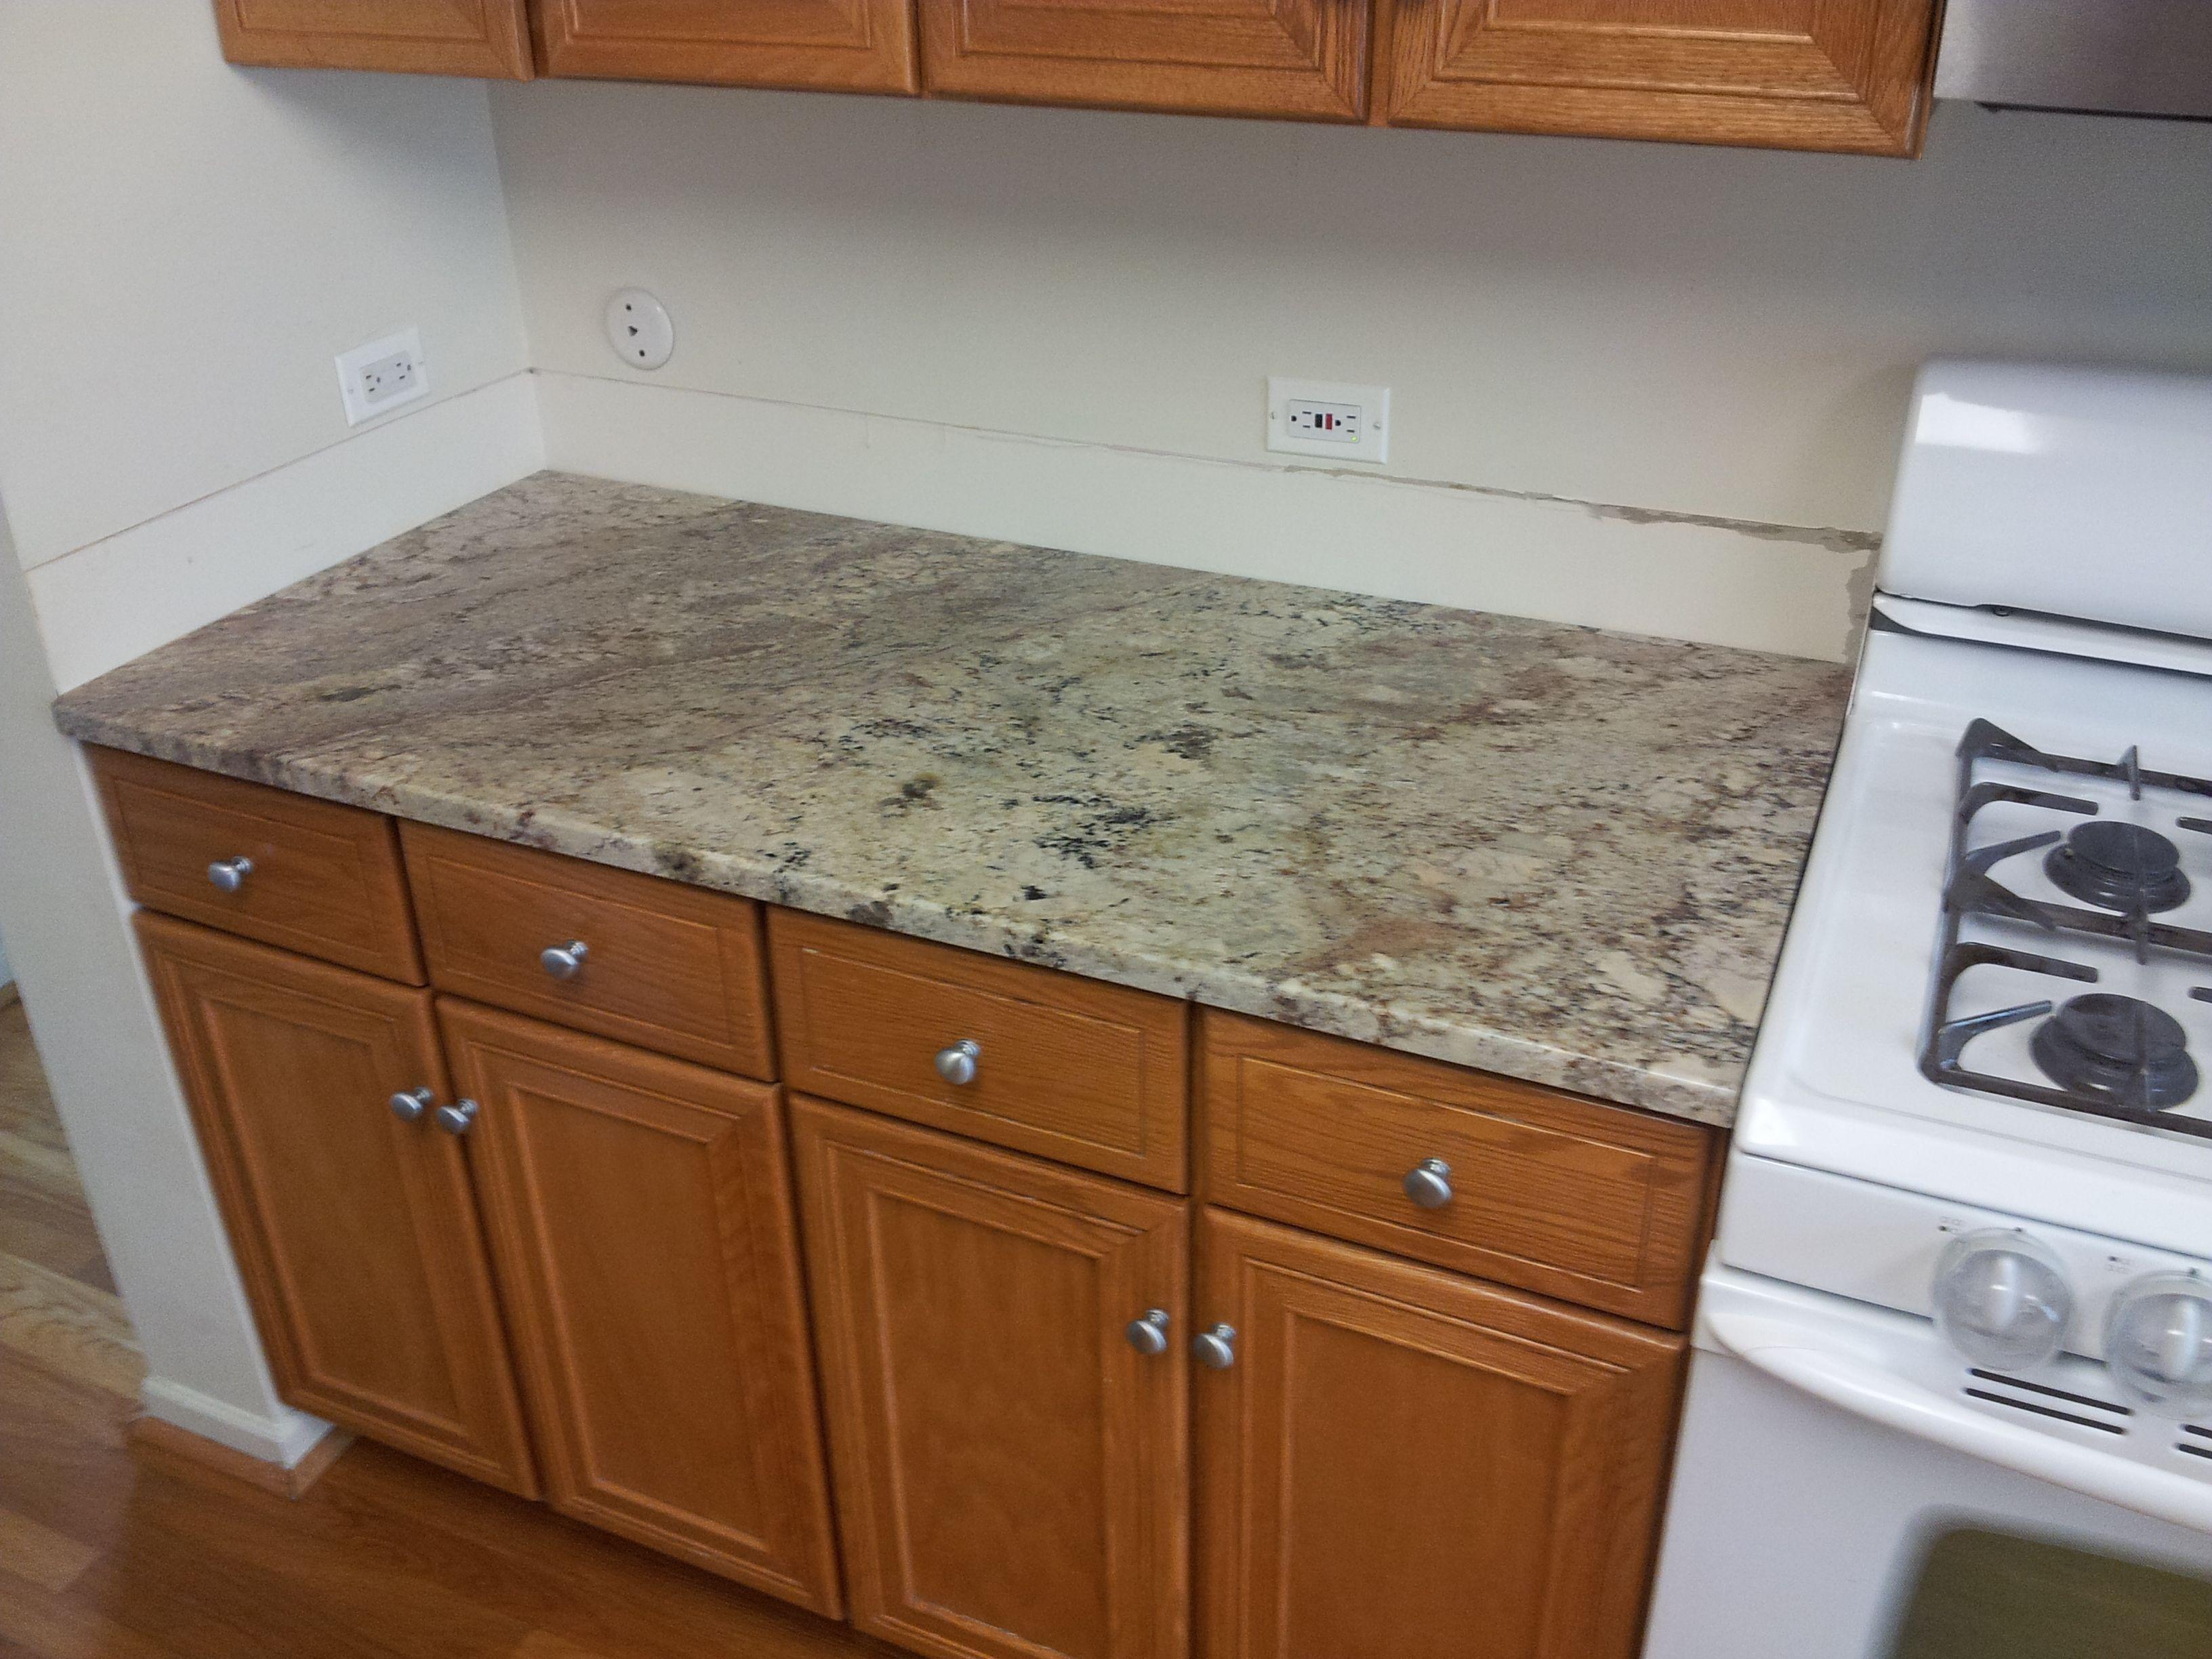 Art Granite Countertops Inc 1020 Lunt Ave Unit F Schaumburg Il